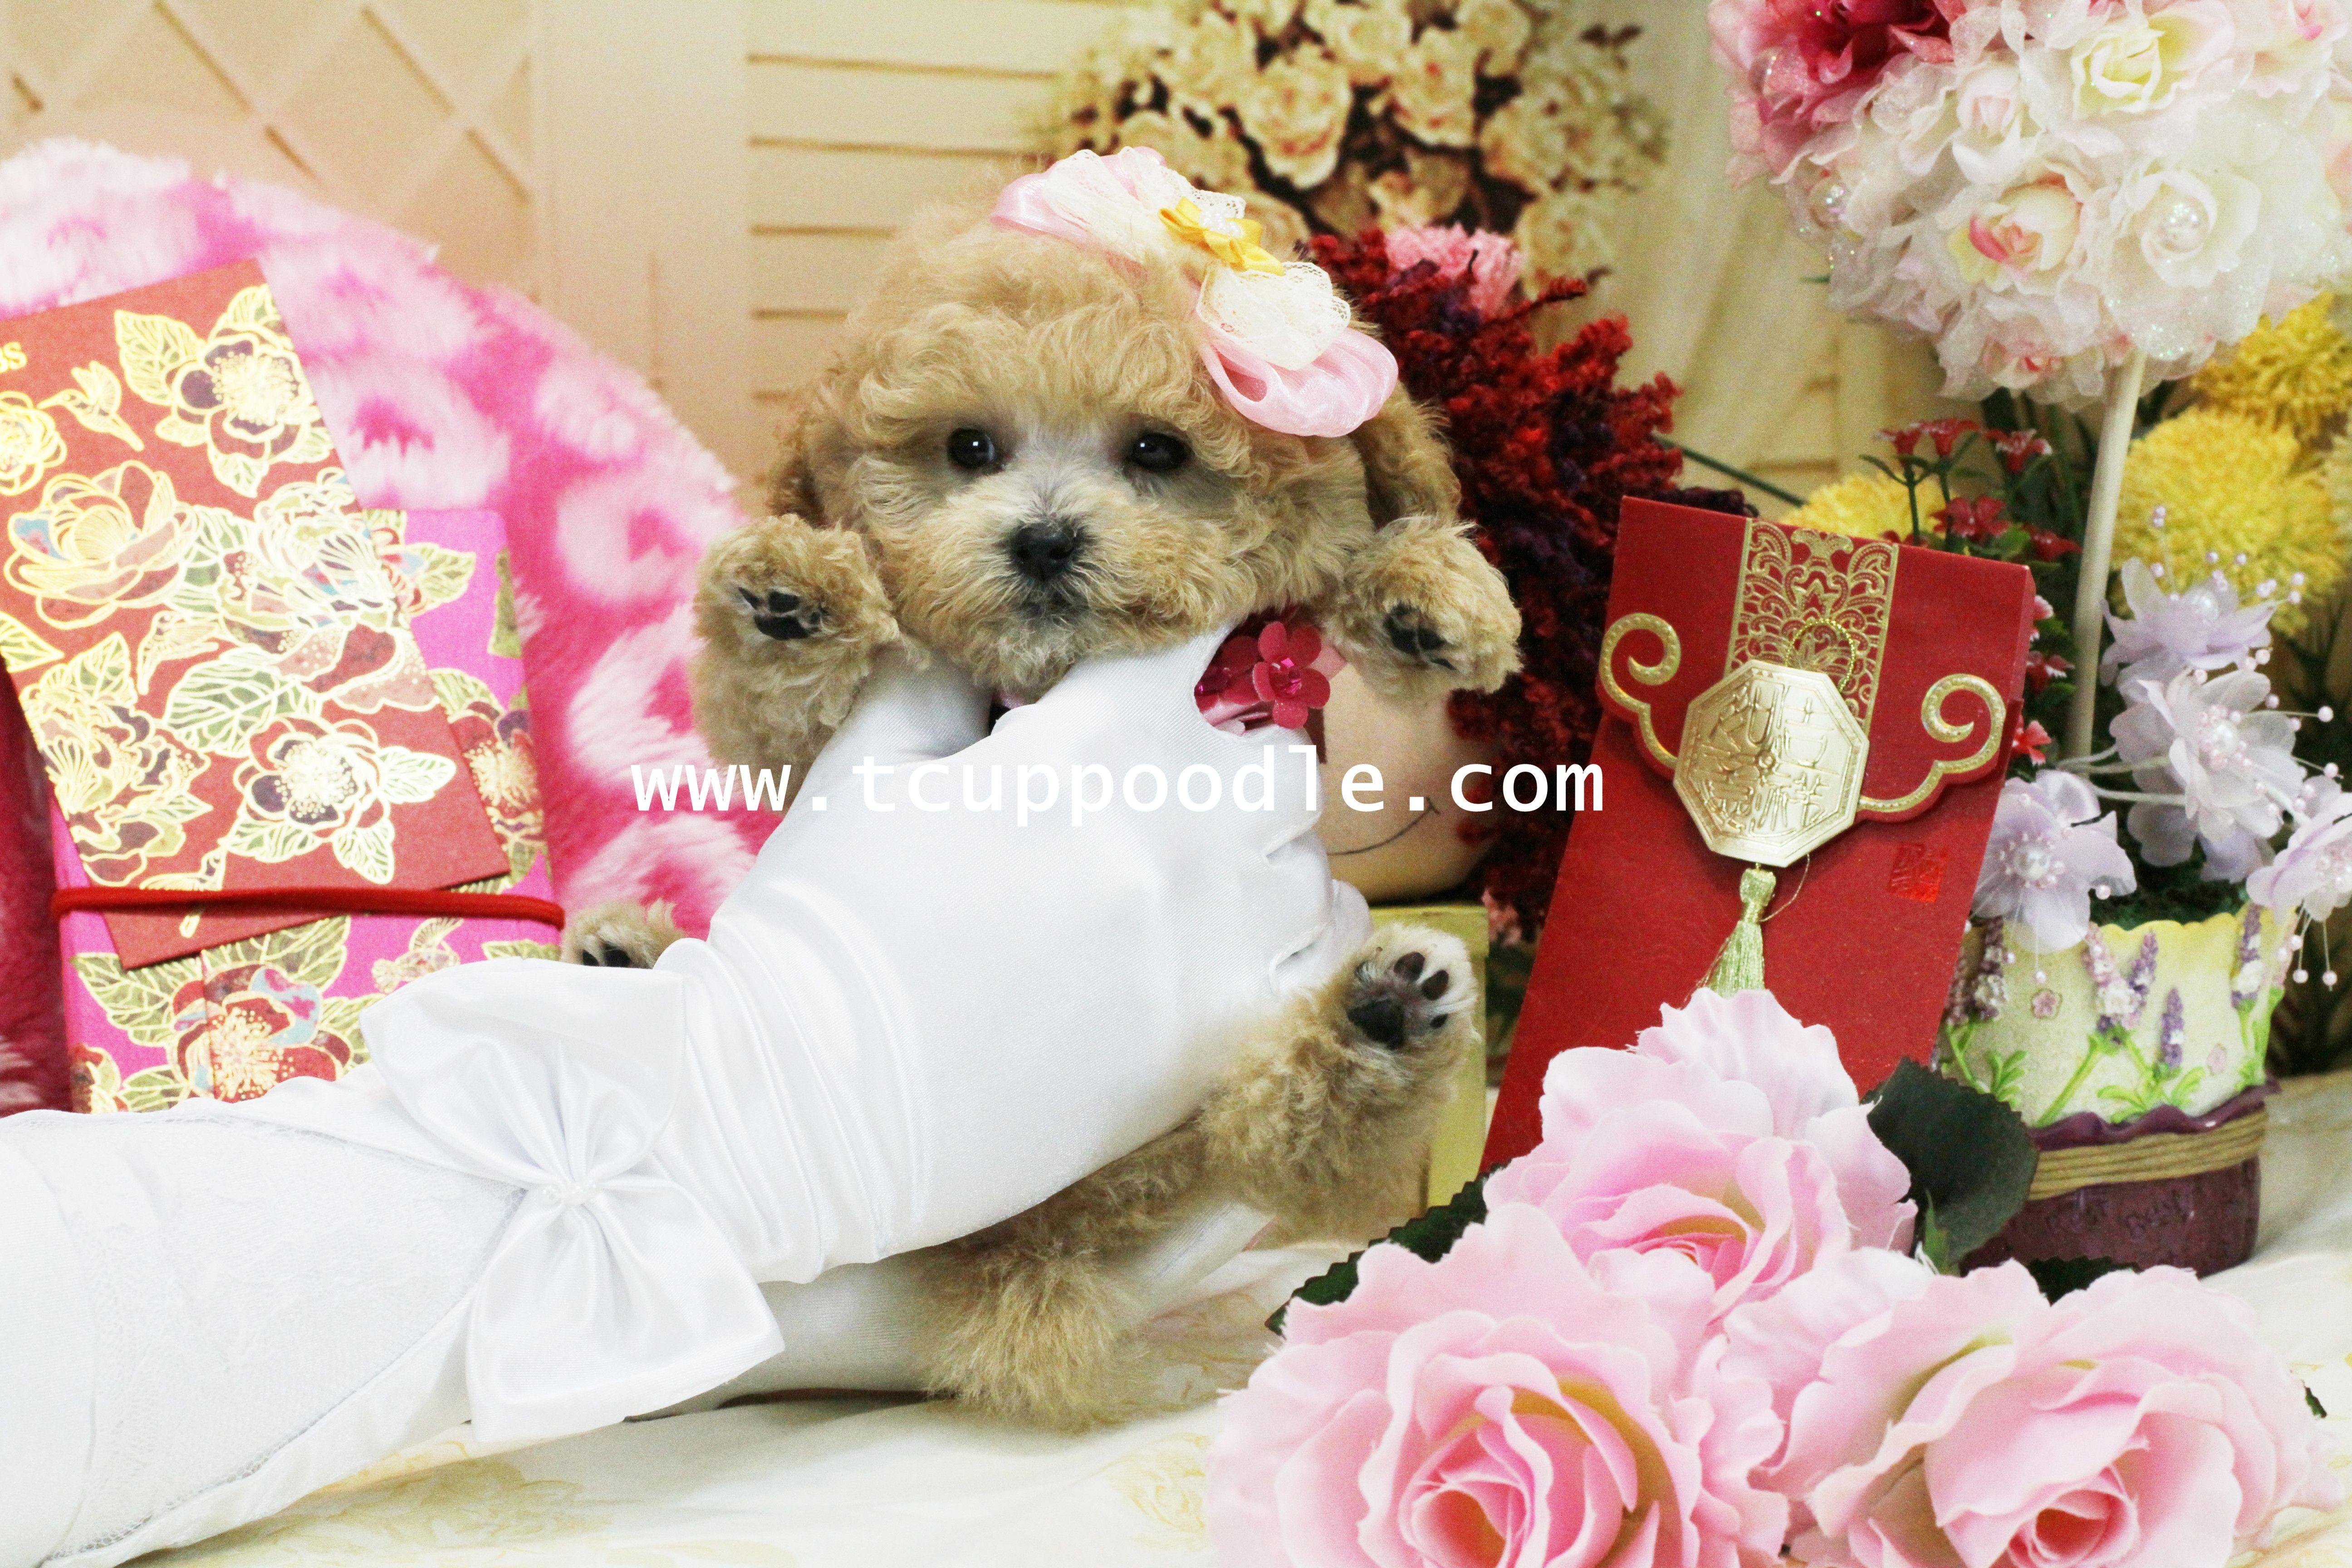 Super Tiny Teacup Poodle no.168 (International Delivery